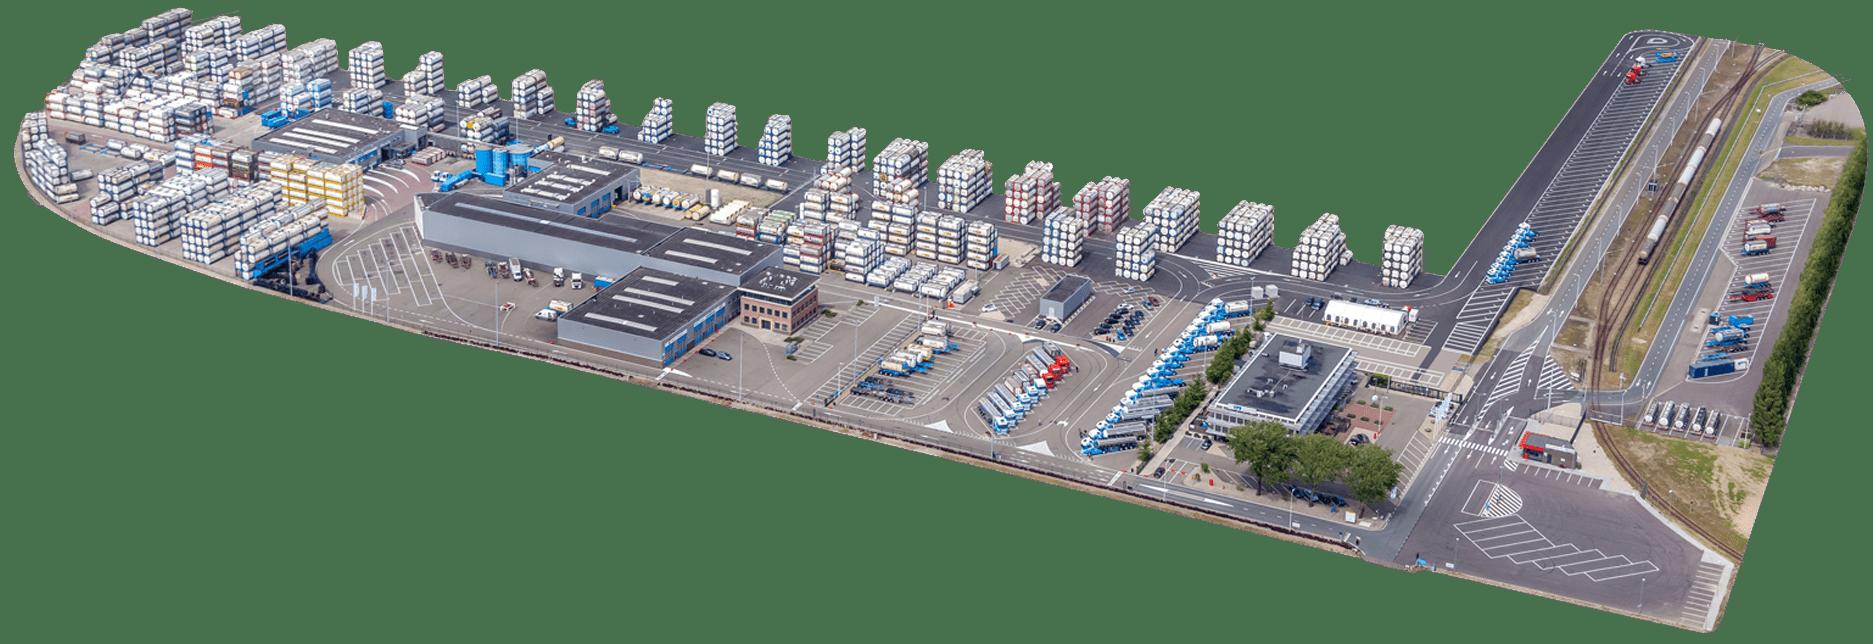 Port 5612 Europoort Rotterdam